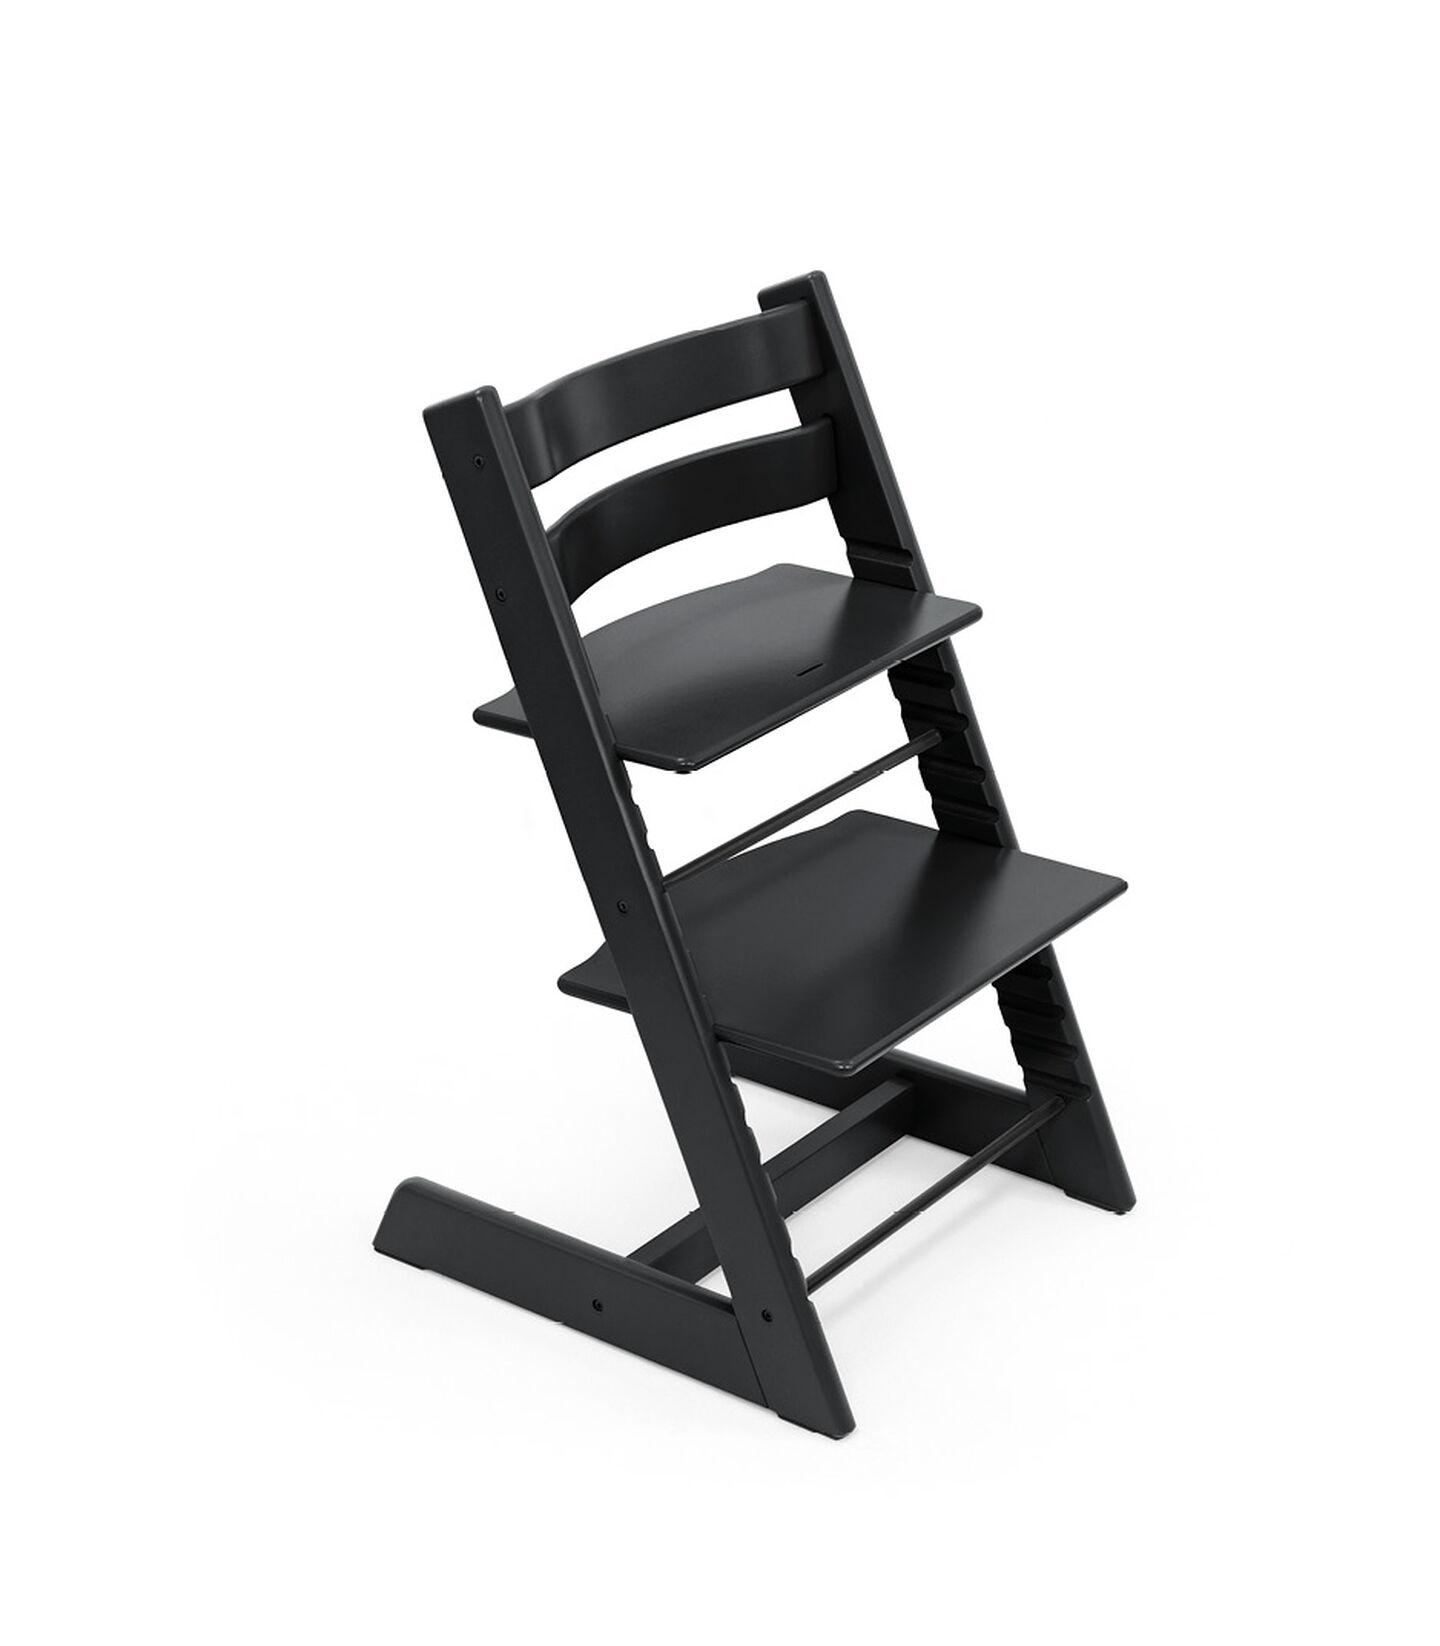 Tripp Trapp® Stuhl Black, Black, mainview view 2